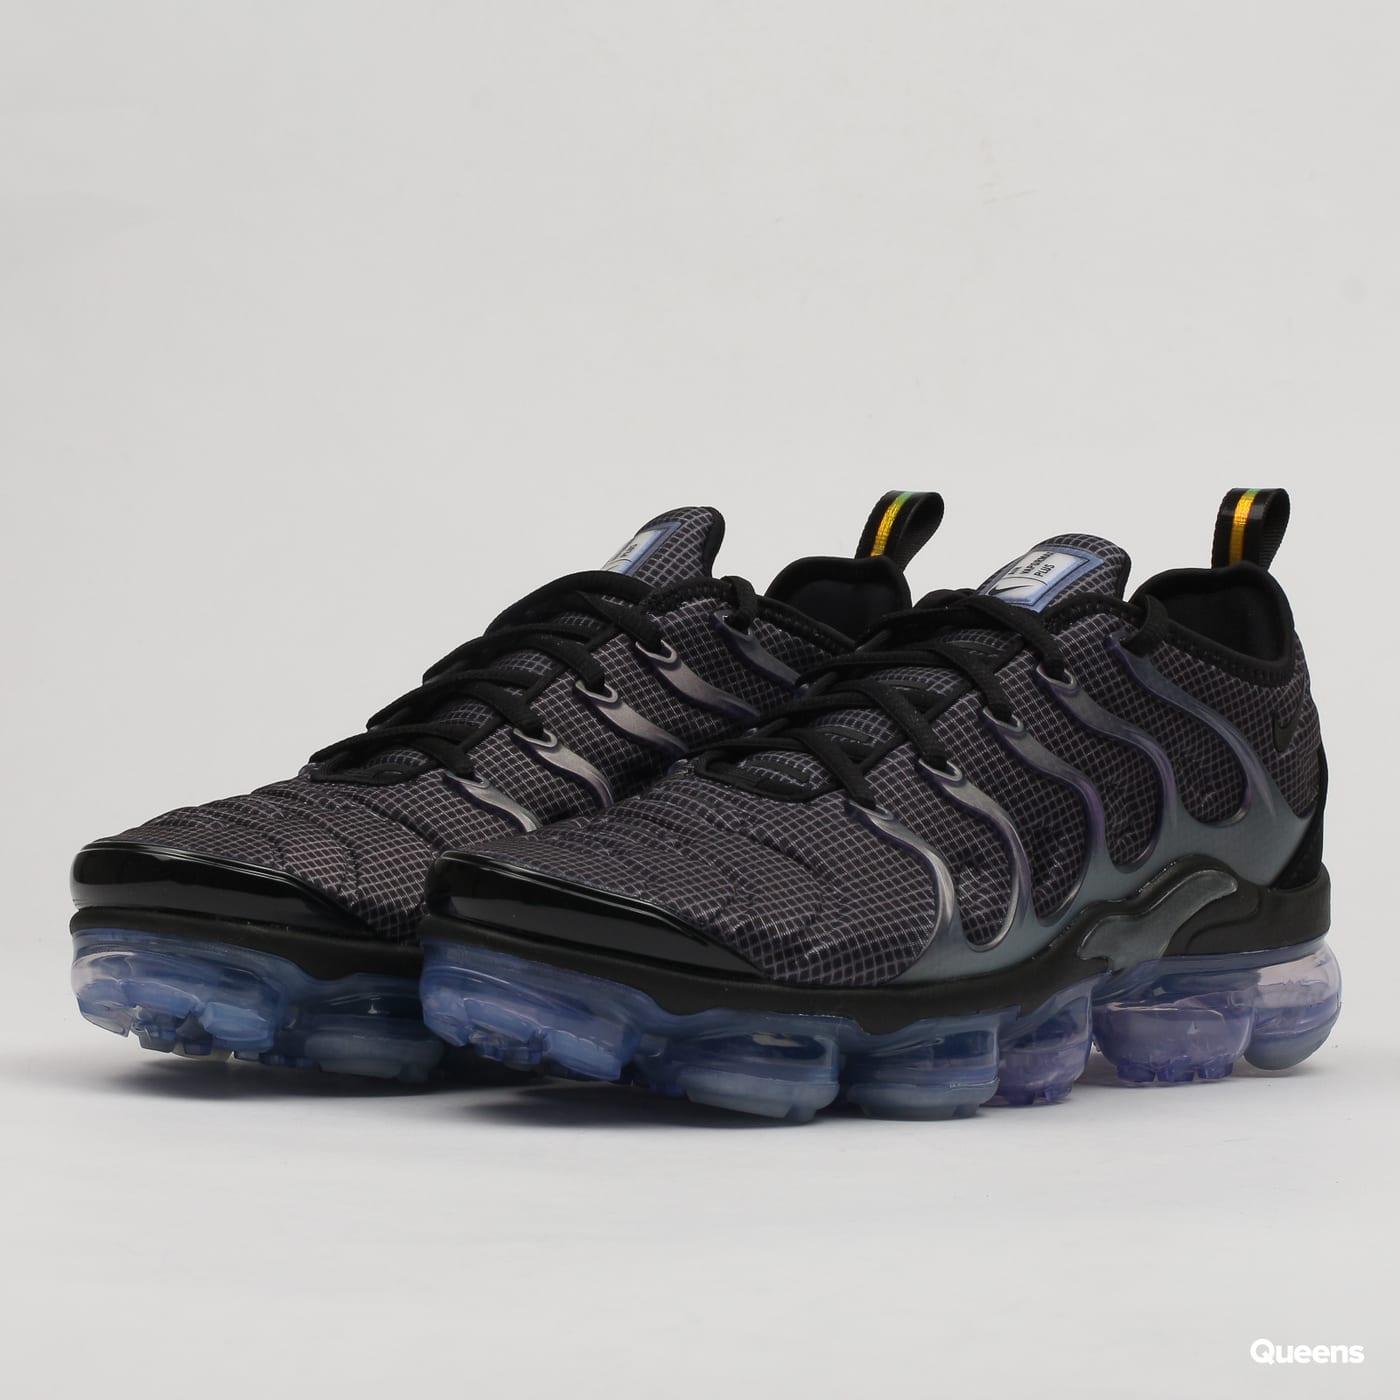 59f6838461a Sneakers Nike Air Vapormax Plus (924453-014)– Queens 💚